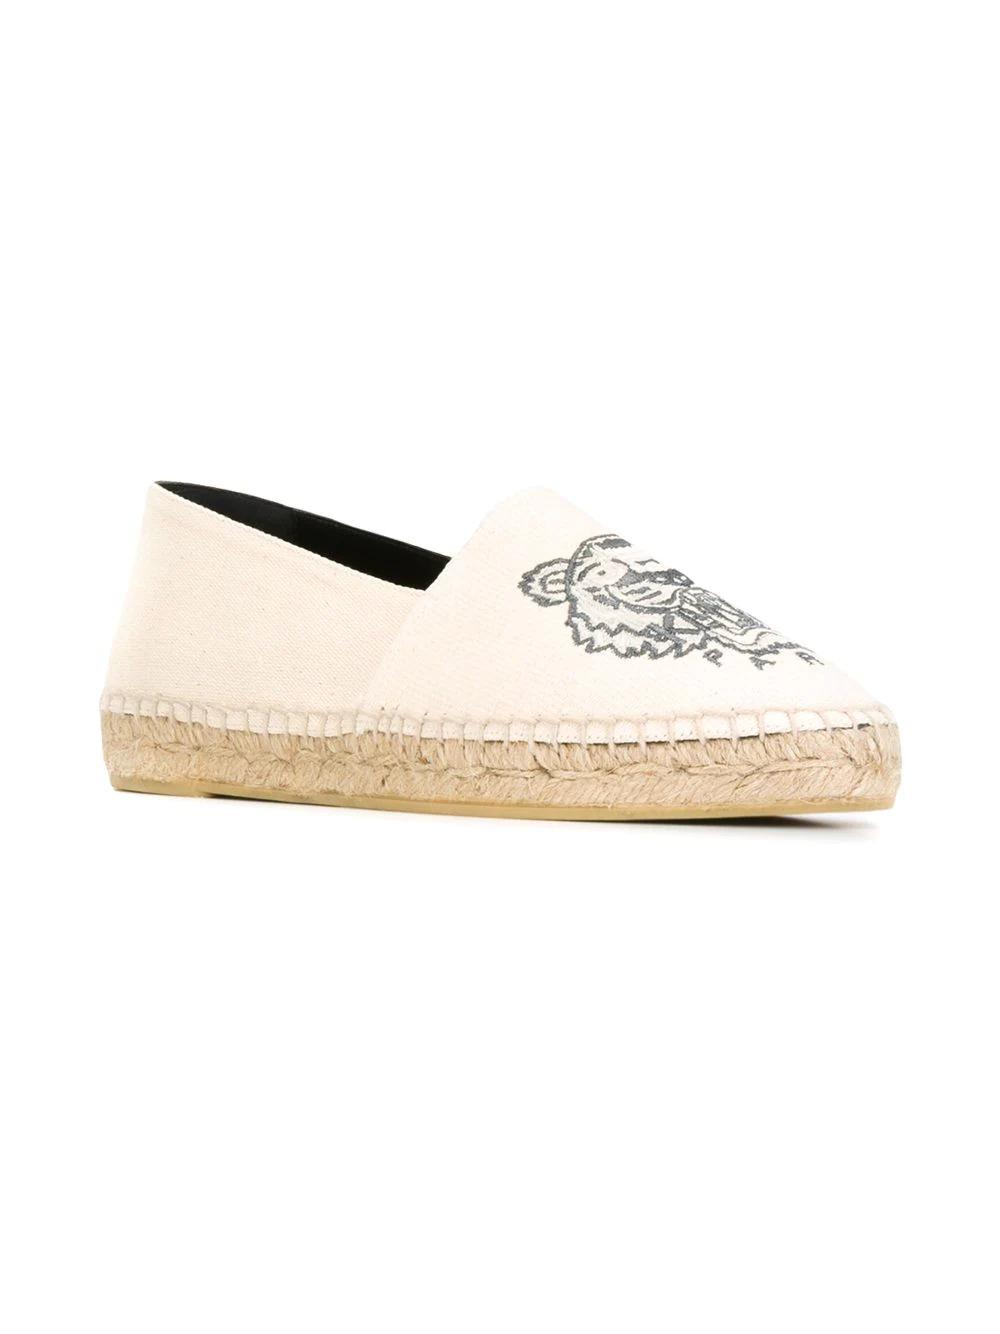 KENZO | Kenzo эспадрильи 'Tiger' | Clouty